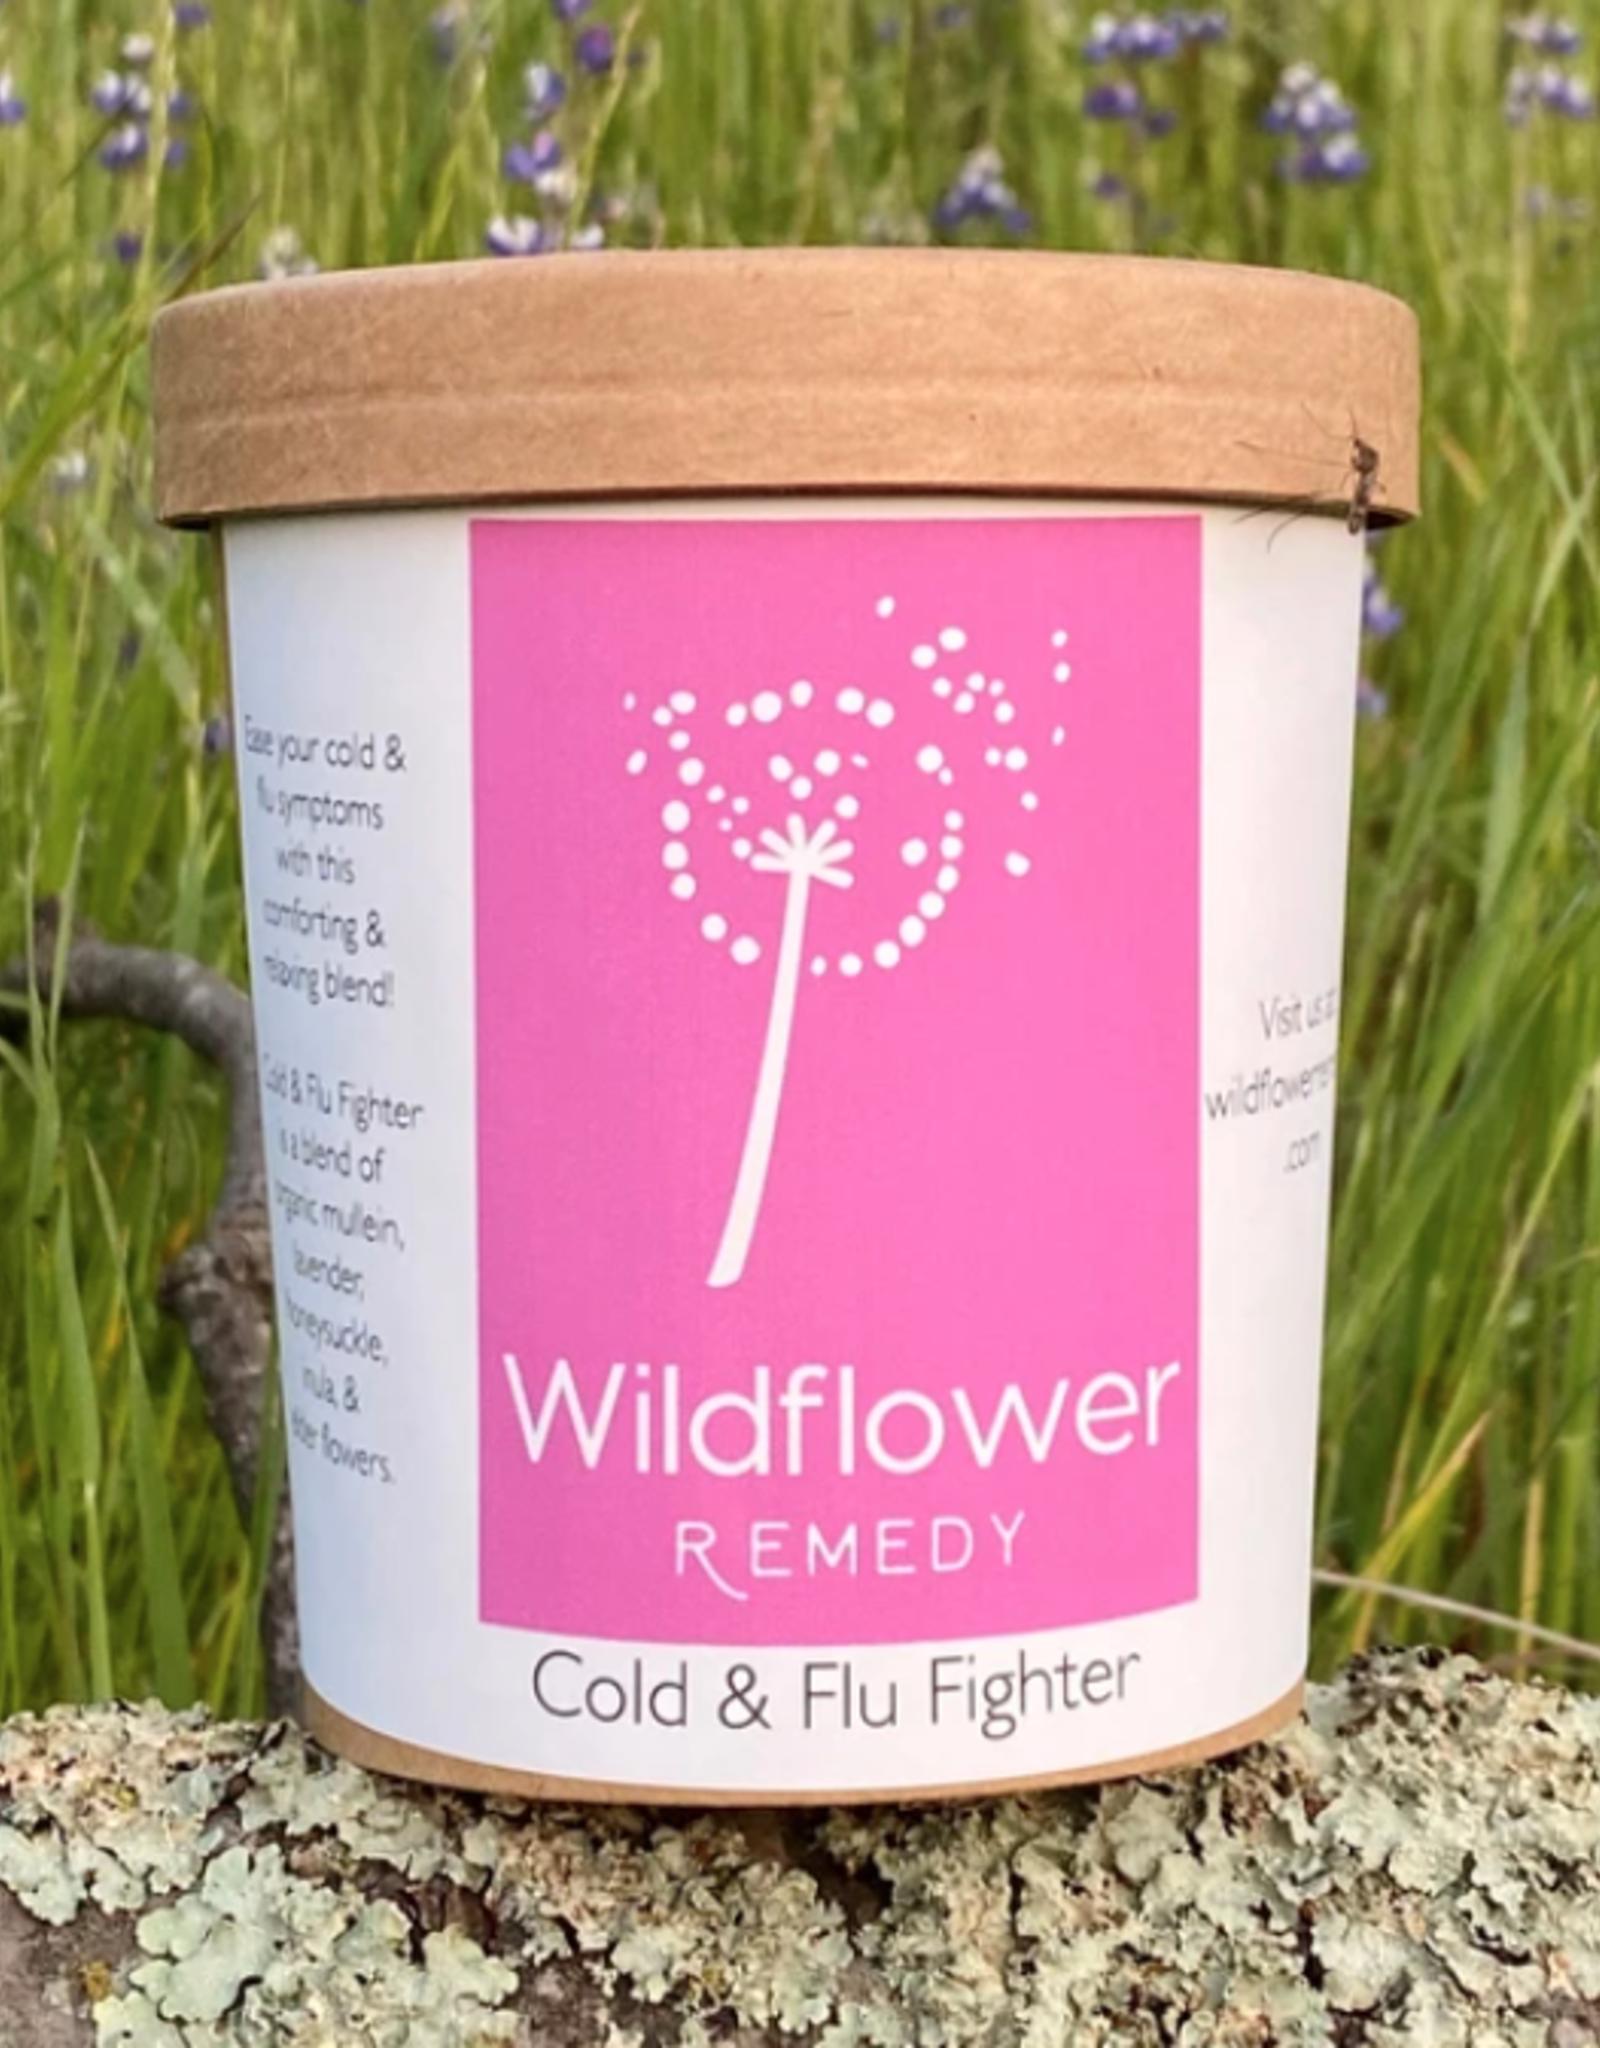 Wildflower Remedy Cold & Flu Fighter Tea